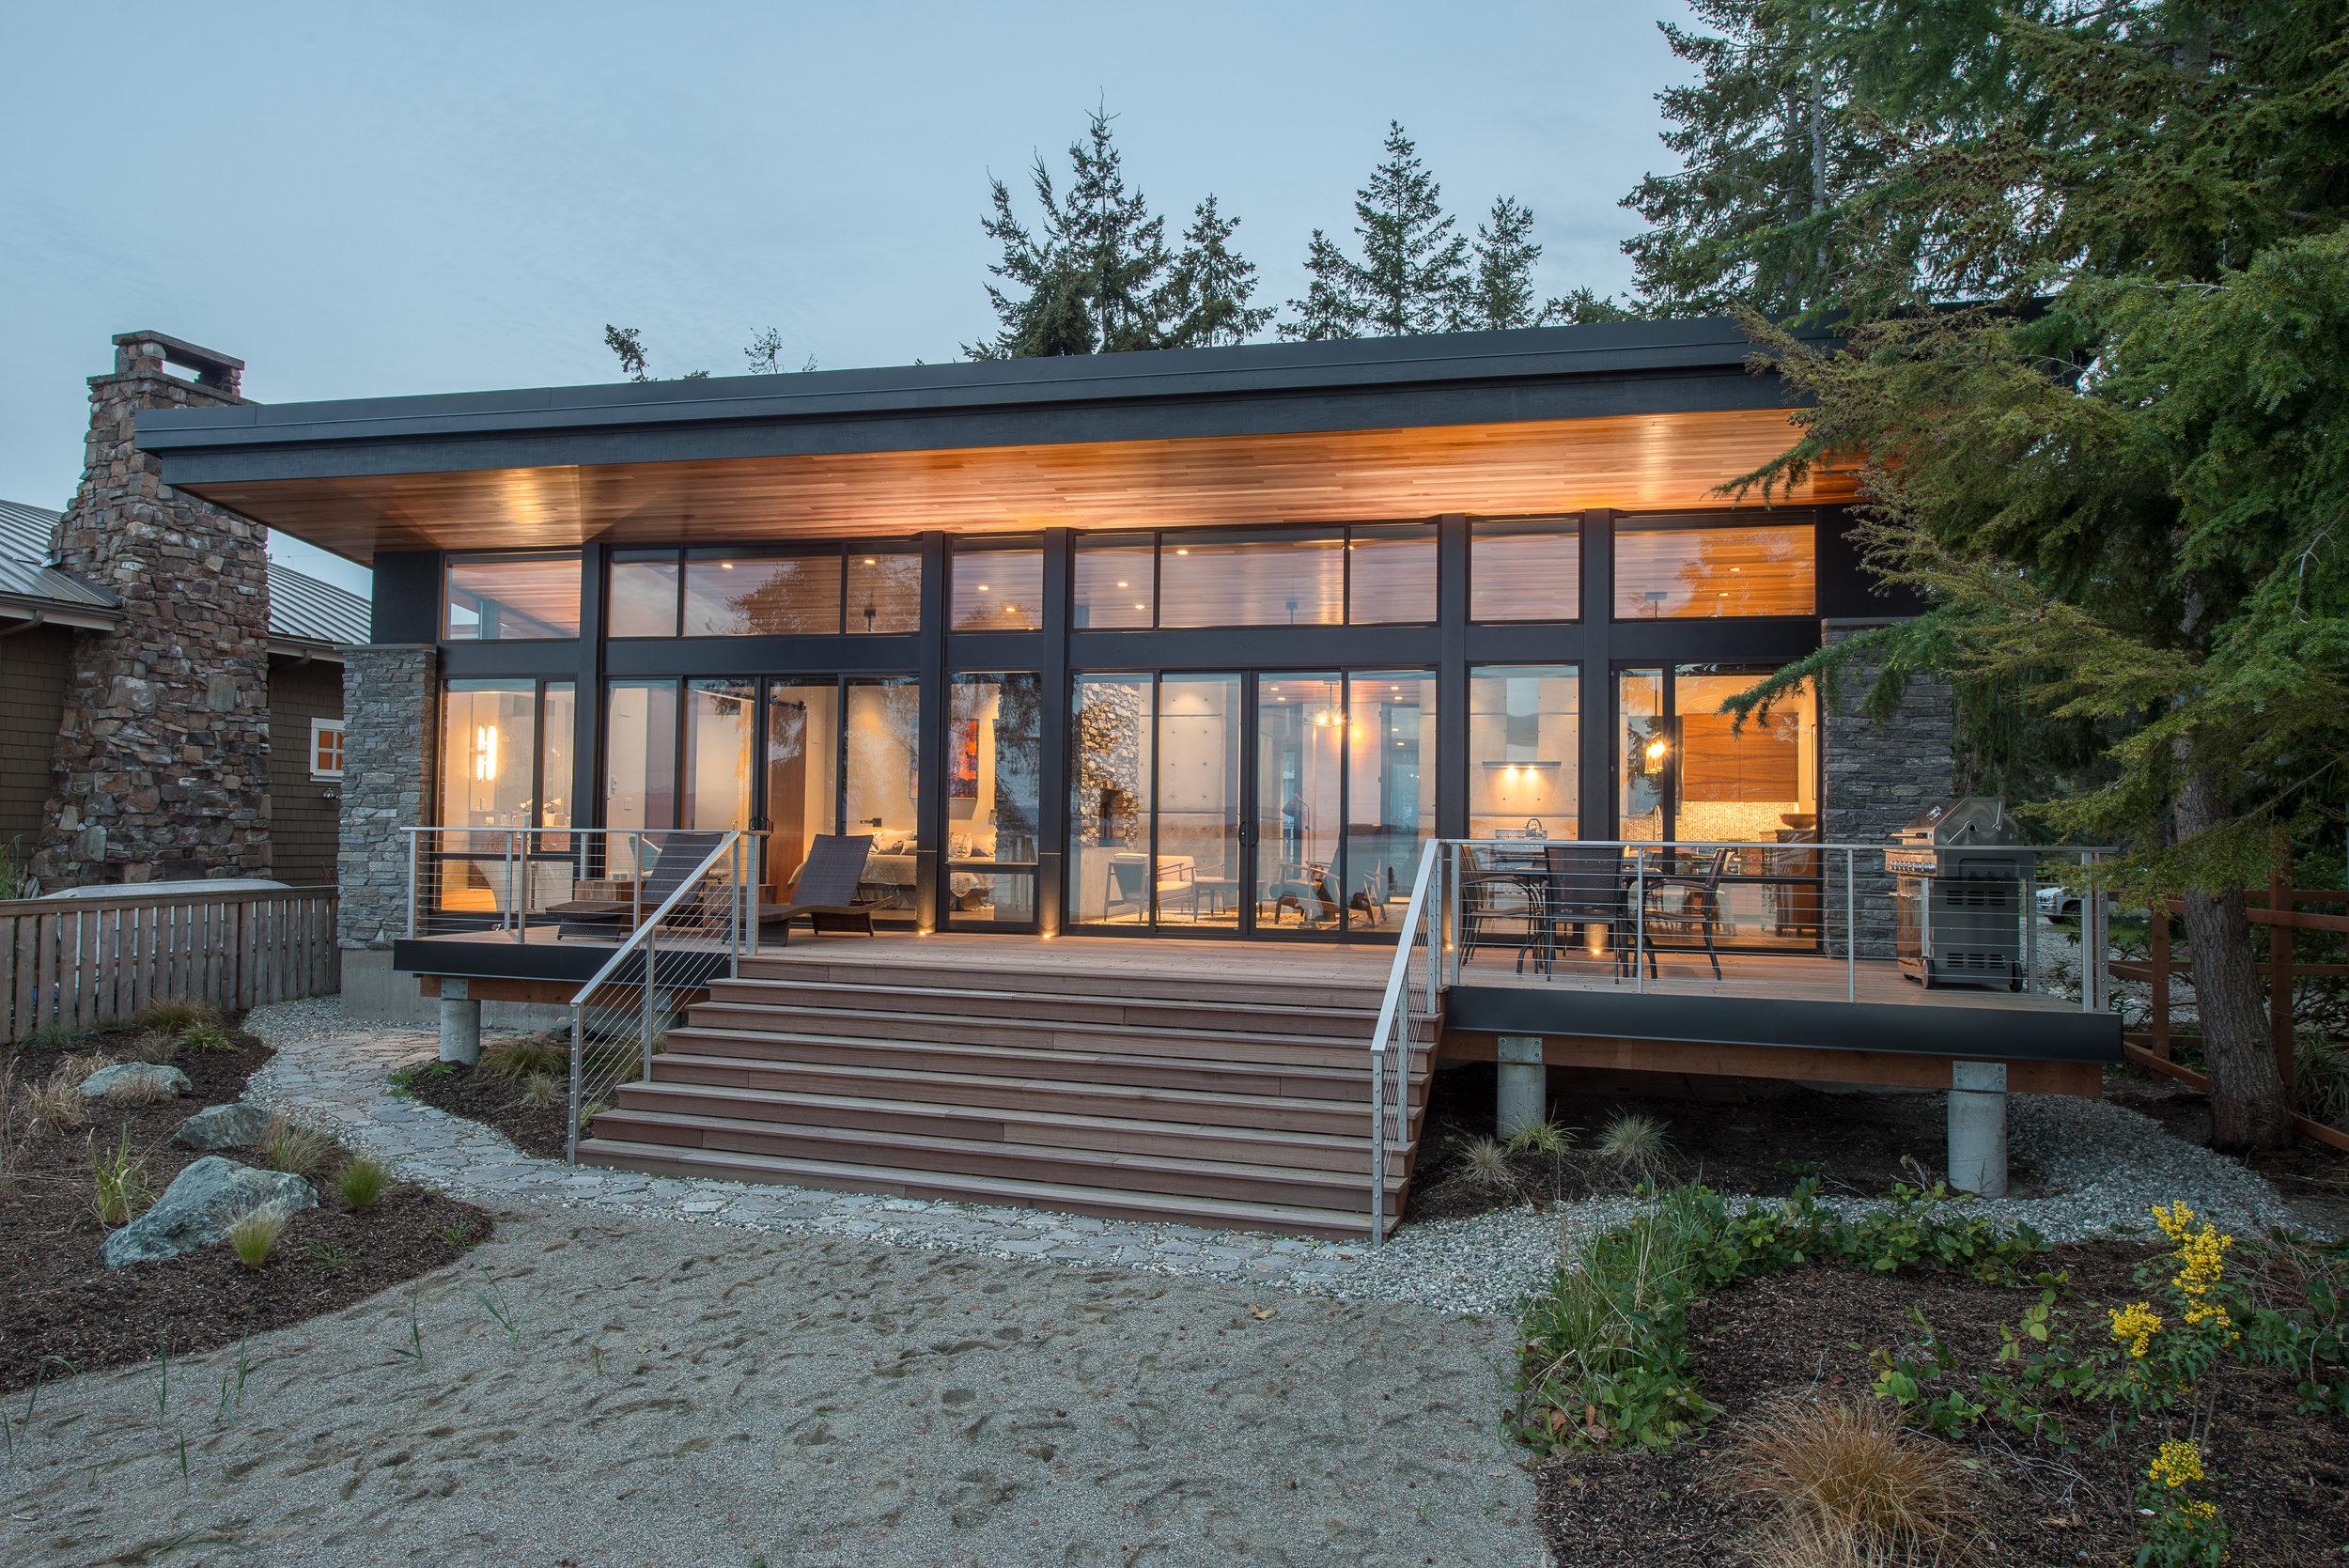 02 - Camano Beach Drive House 5000px - Swift Studio.jpg